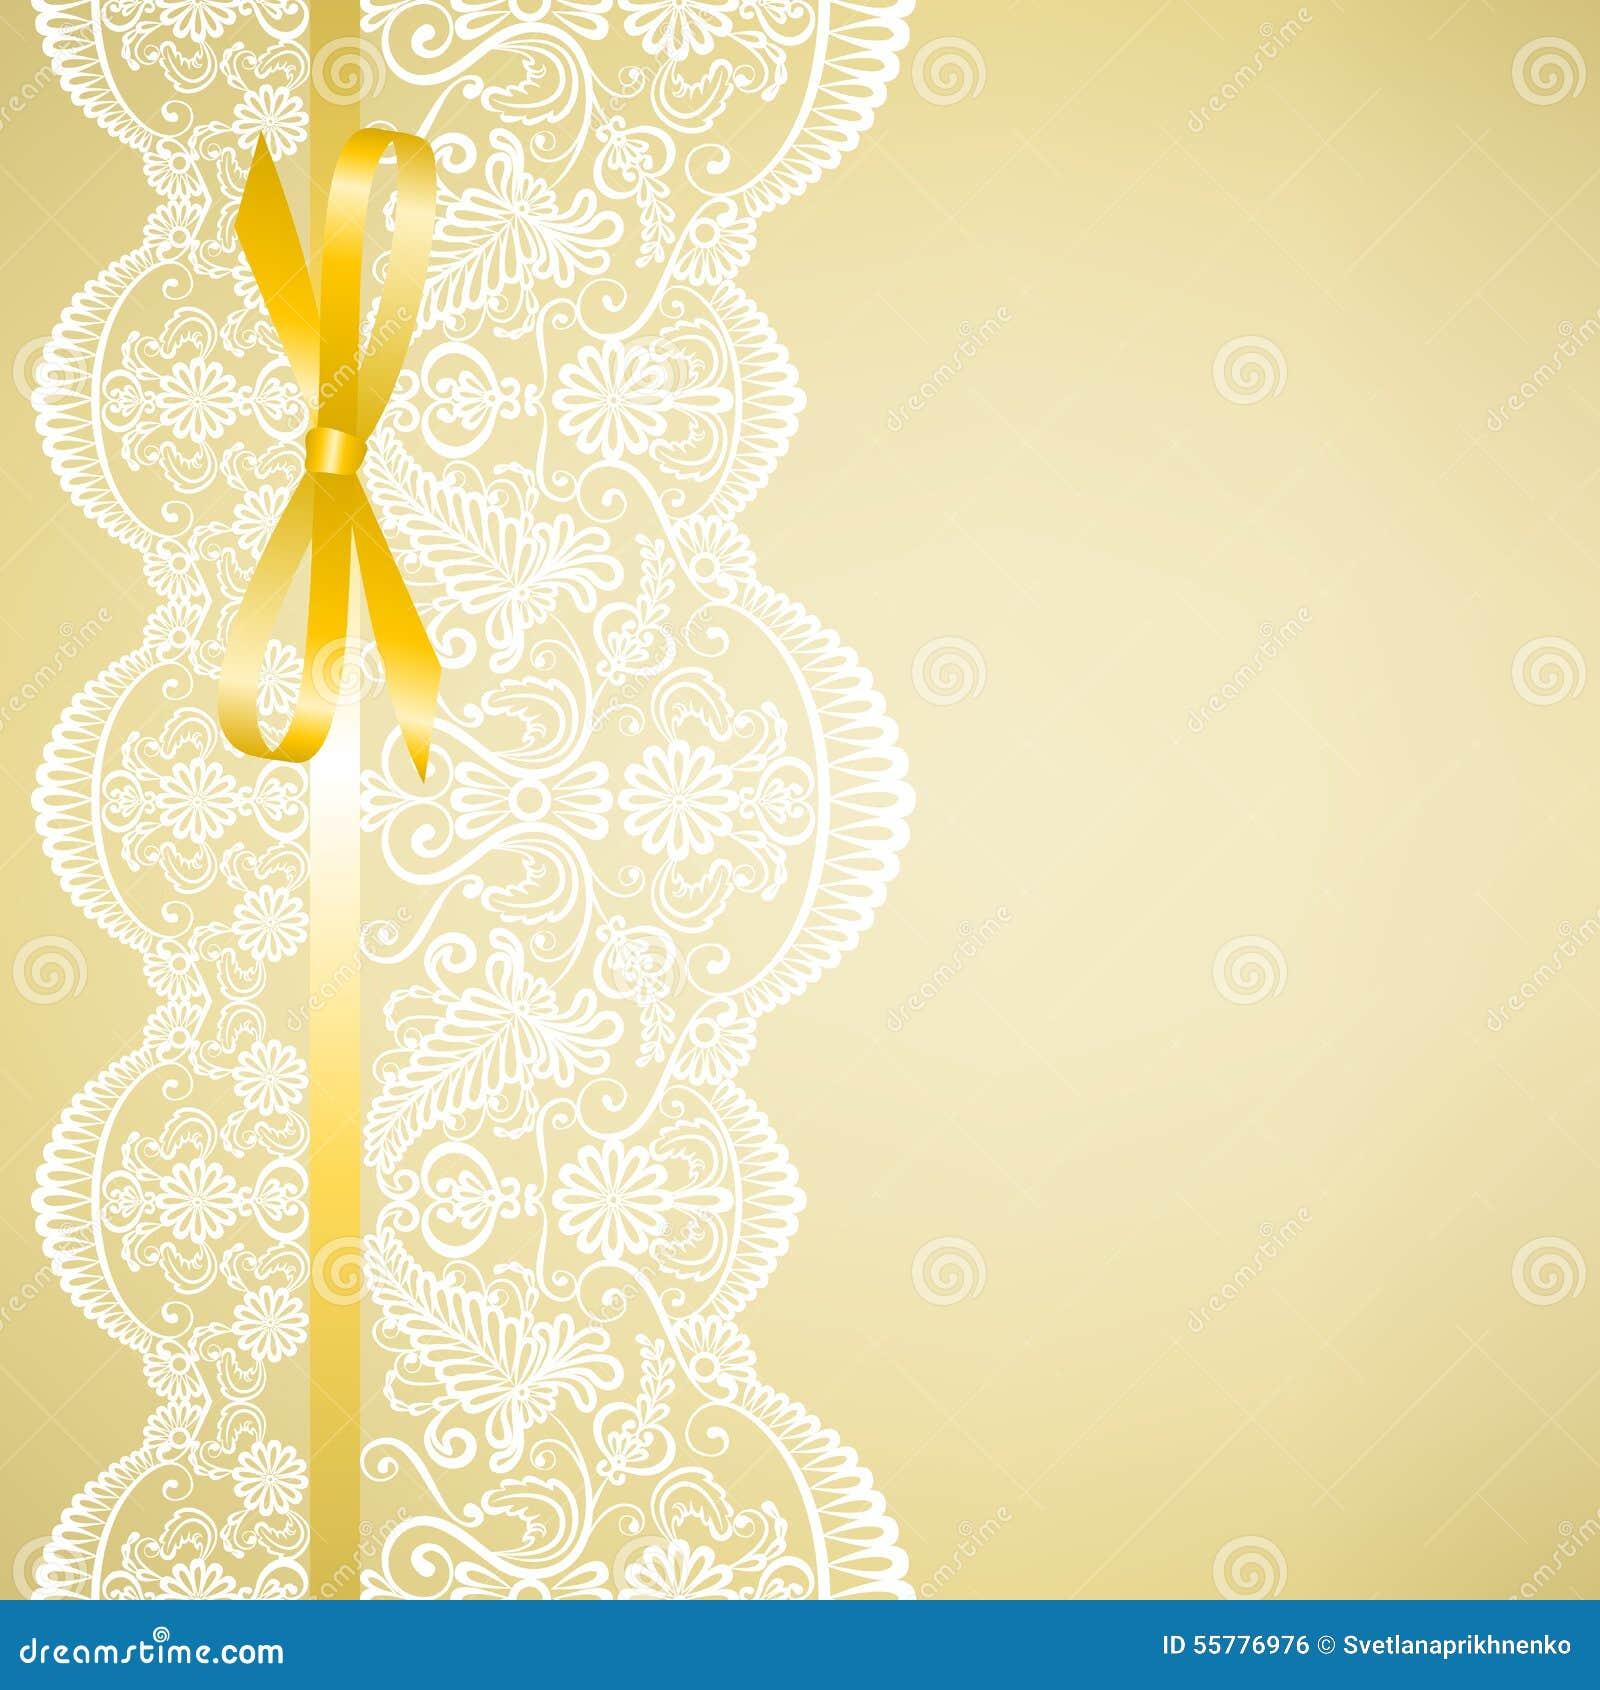 wedding invitation background designs free download yellow With wedding invitation background designs yellow